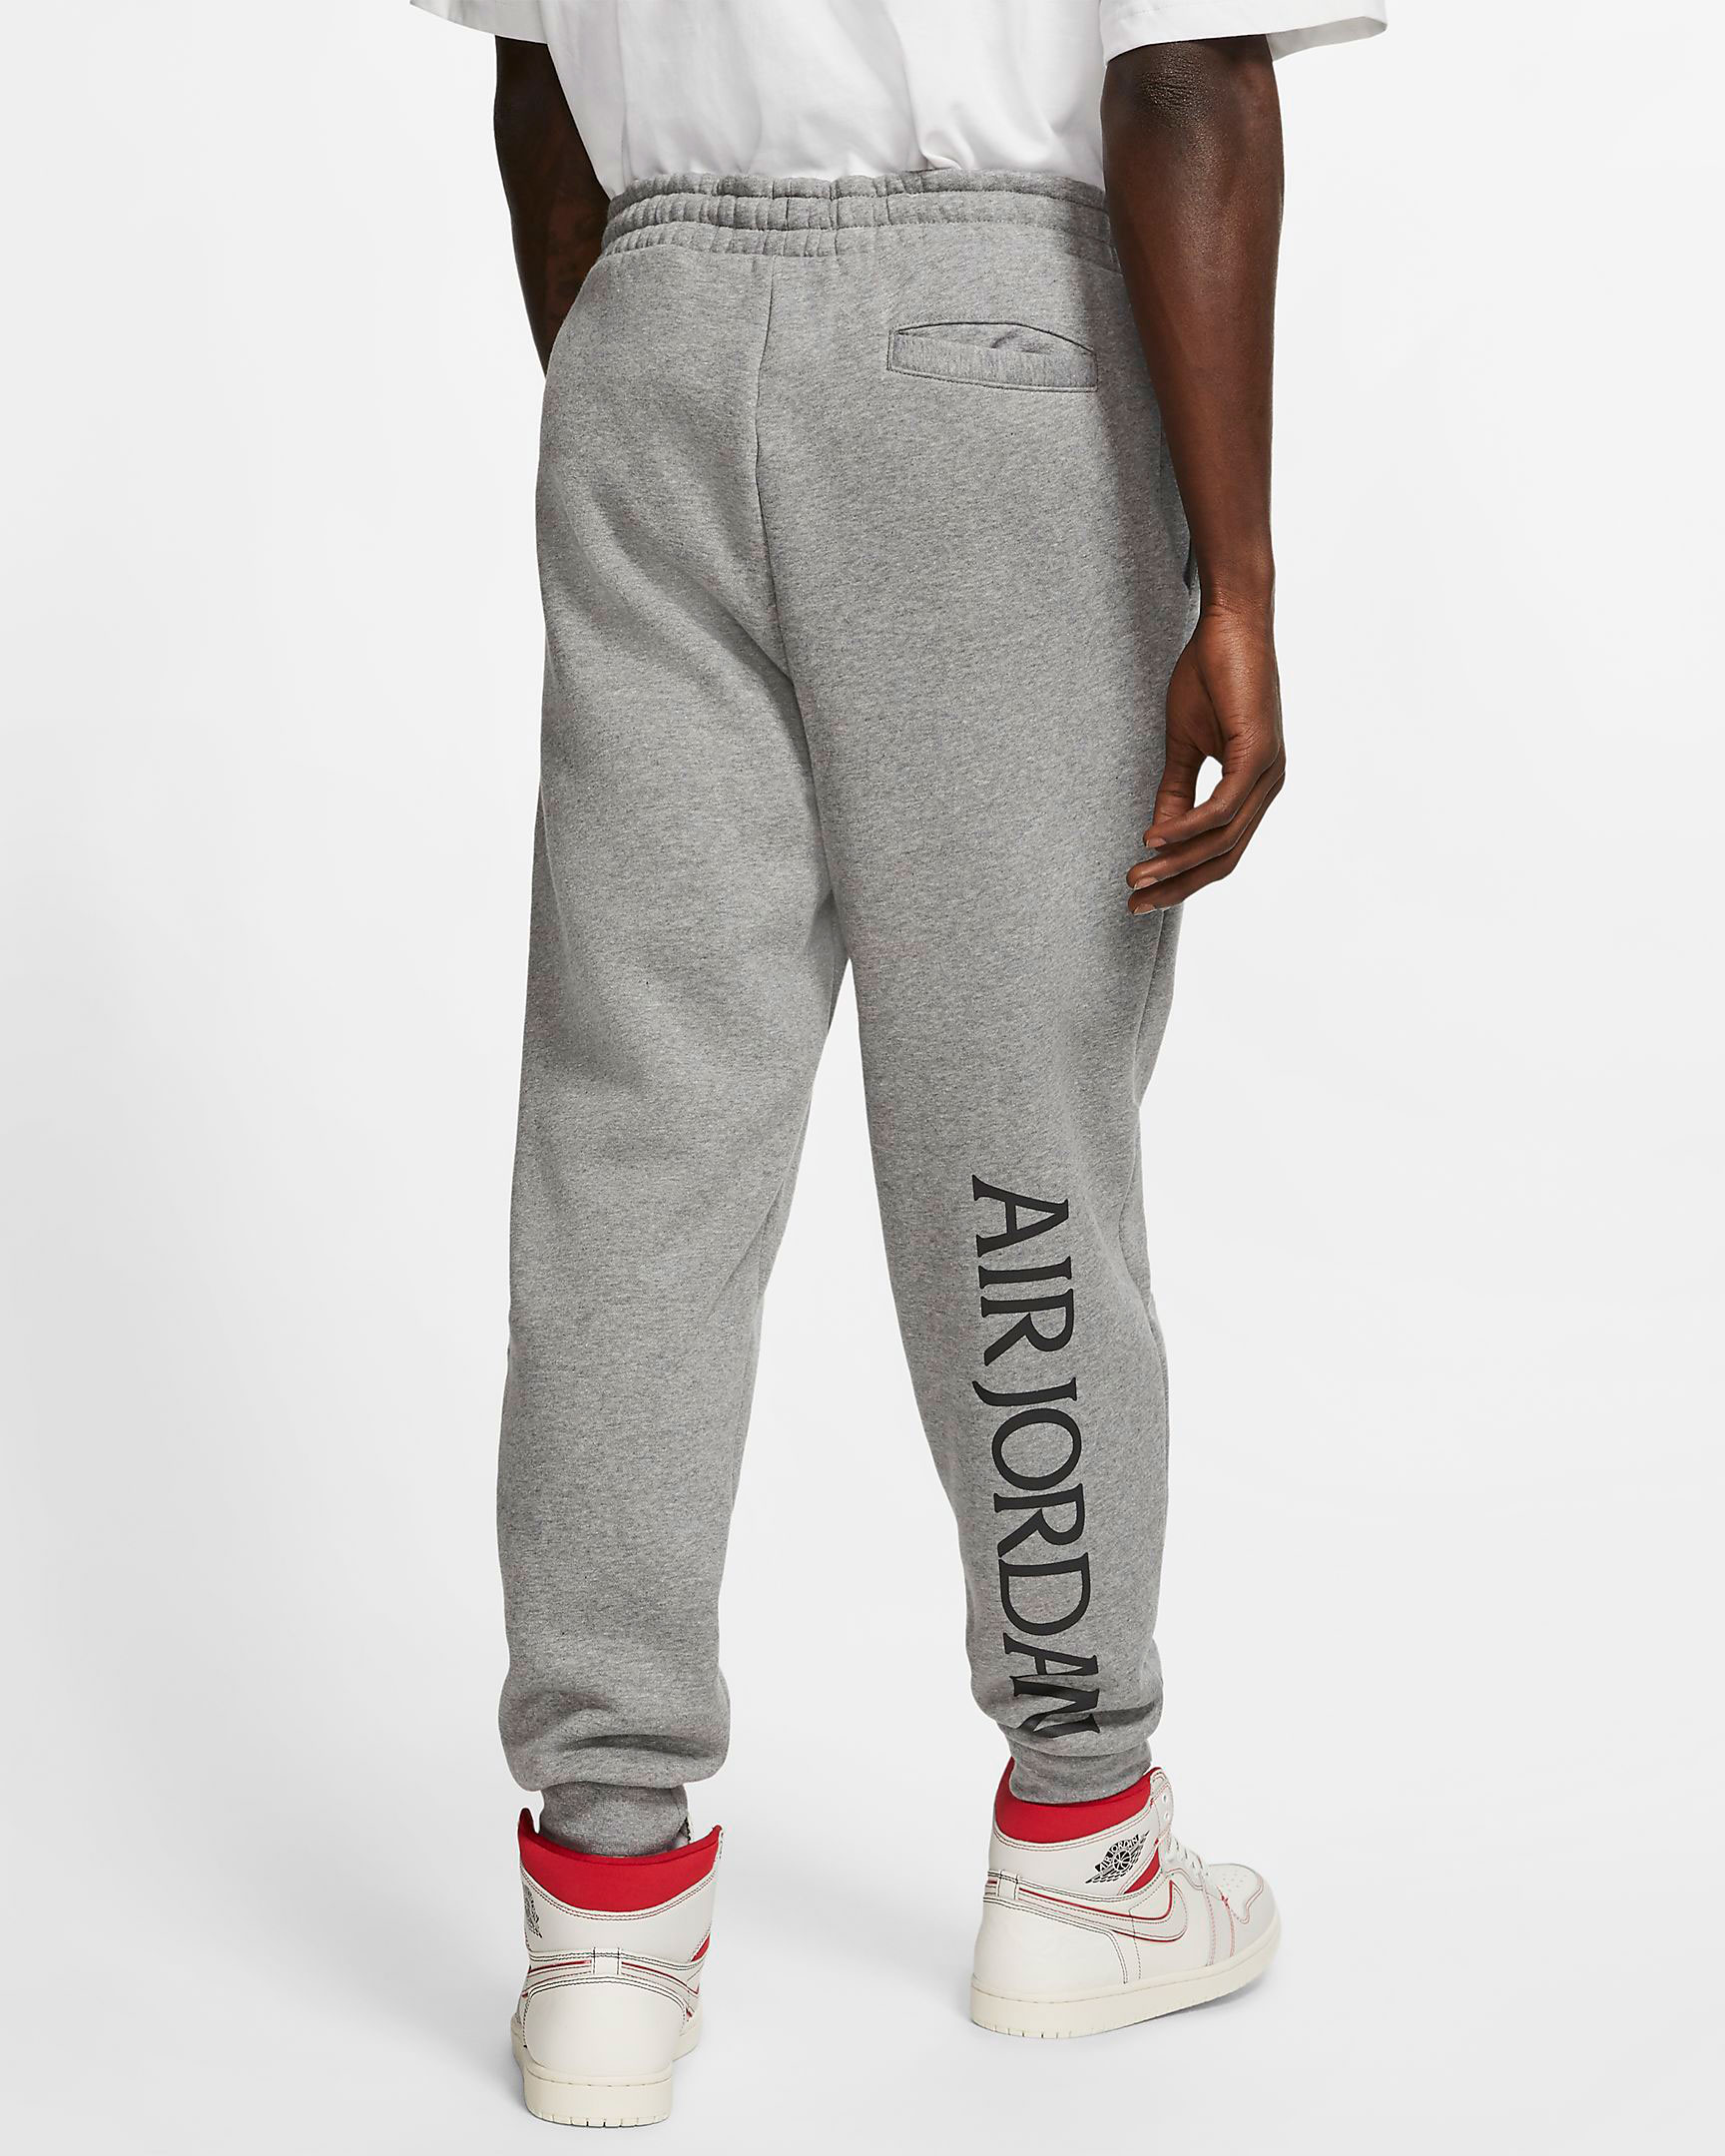 air-jordan-1-high-gym-red-jogger-pants-3